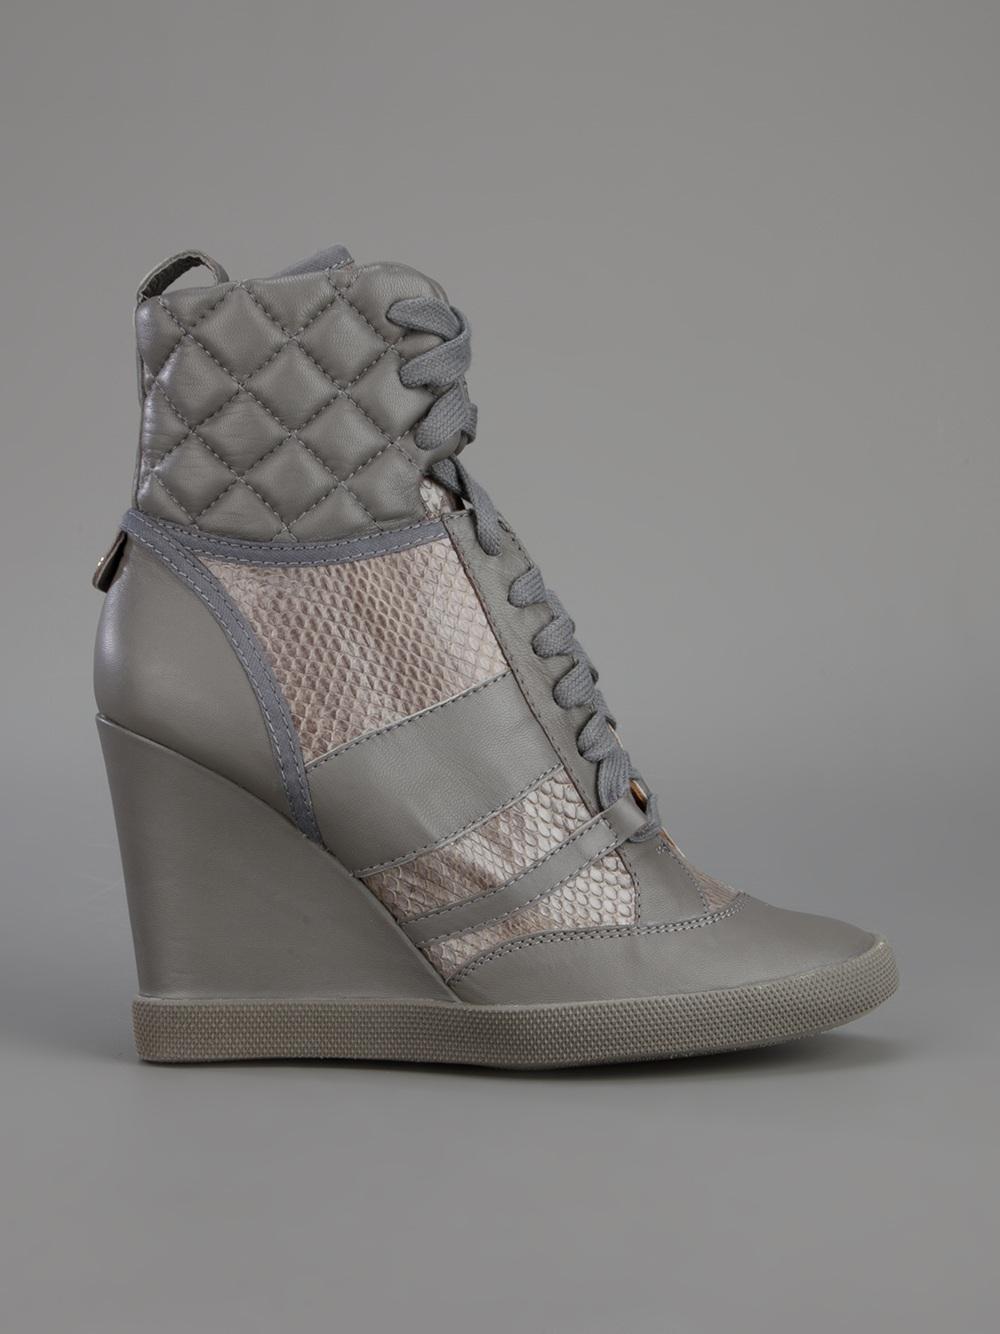 chlo wedge heel sneaker in gray lyst. Black Bedroom Furniture Sets. Home Design Ideas